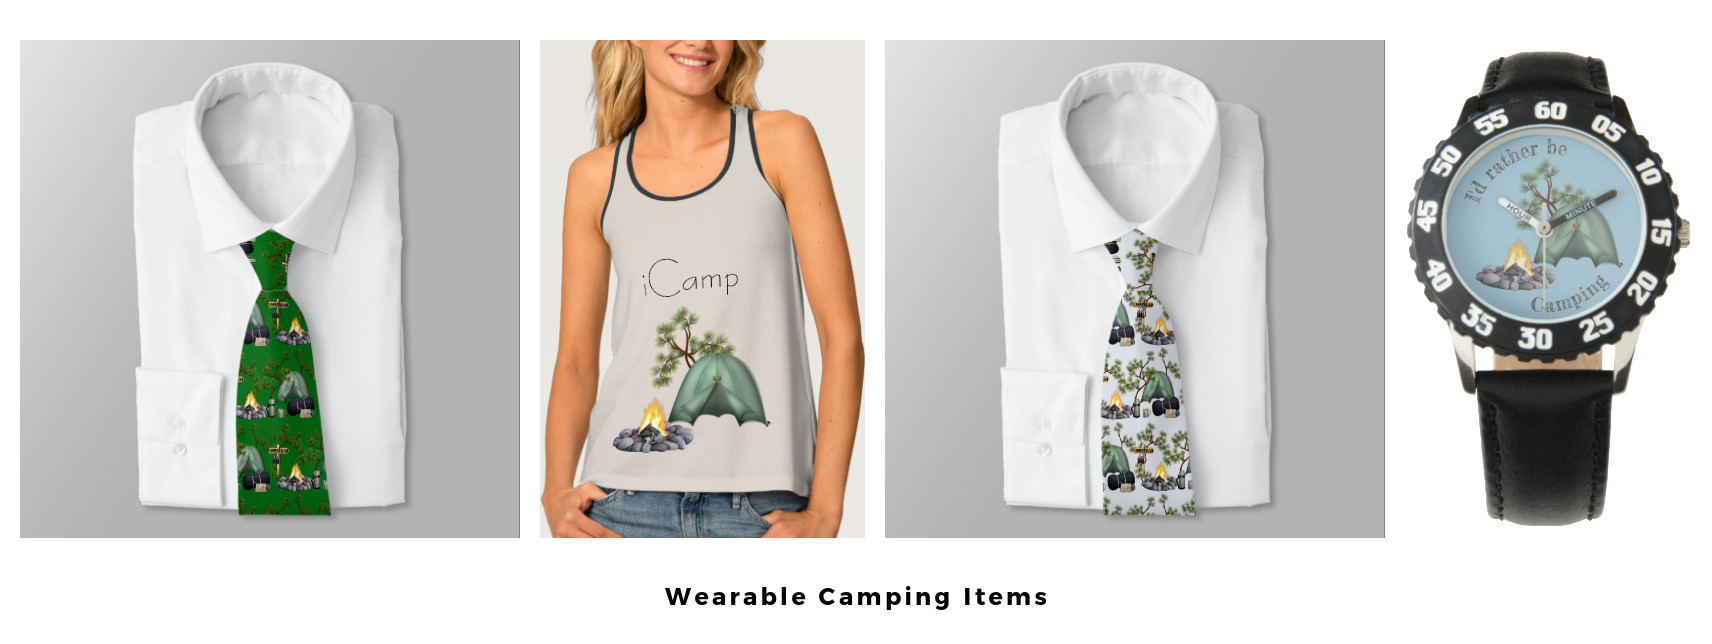 camping, tent camping, tank top, ties, watch